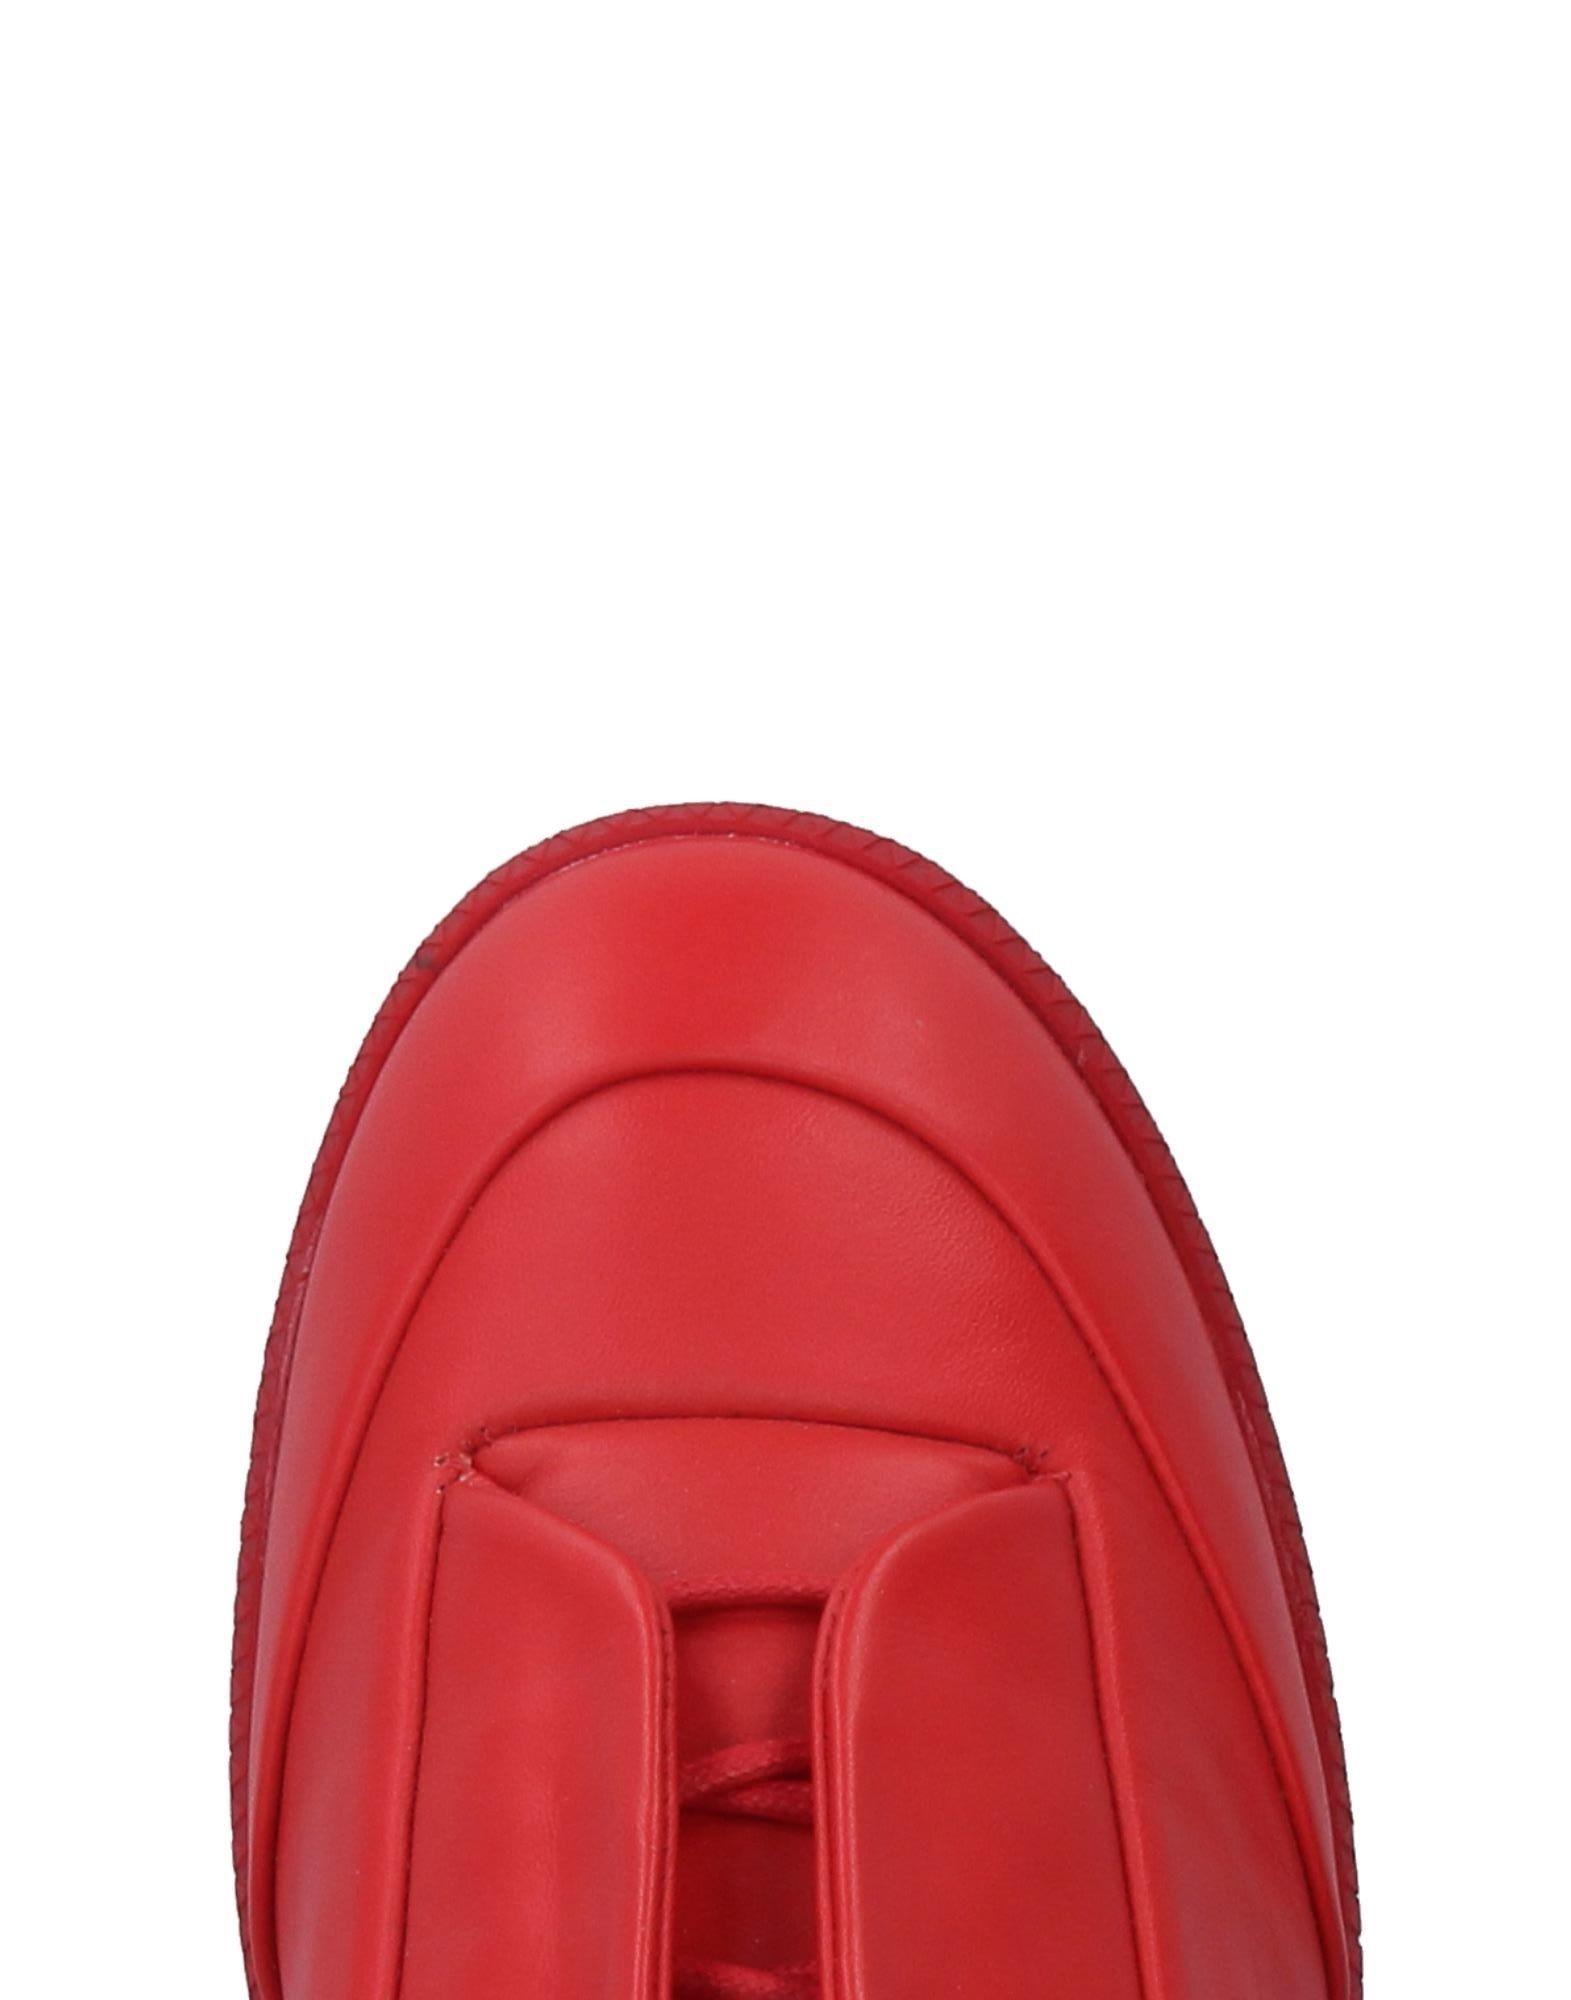 Maison Margiela Gute Sneakers Herren  11265671LB Gute Margiela Qualität beliebte Schuhe d92aa6